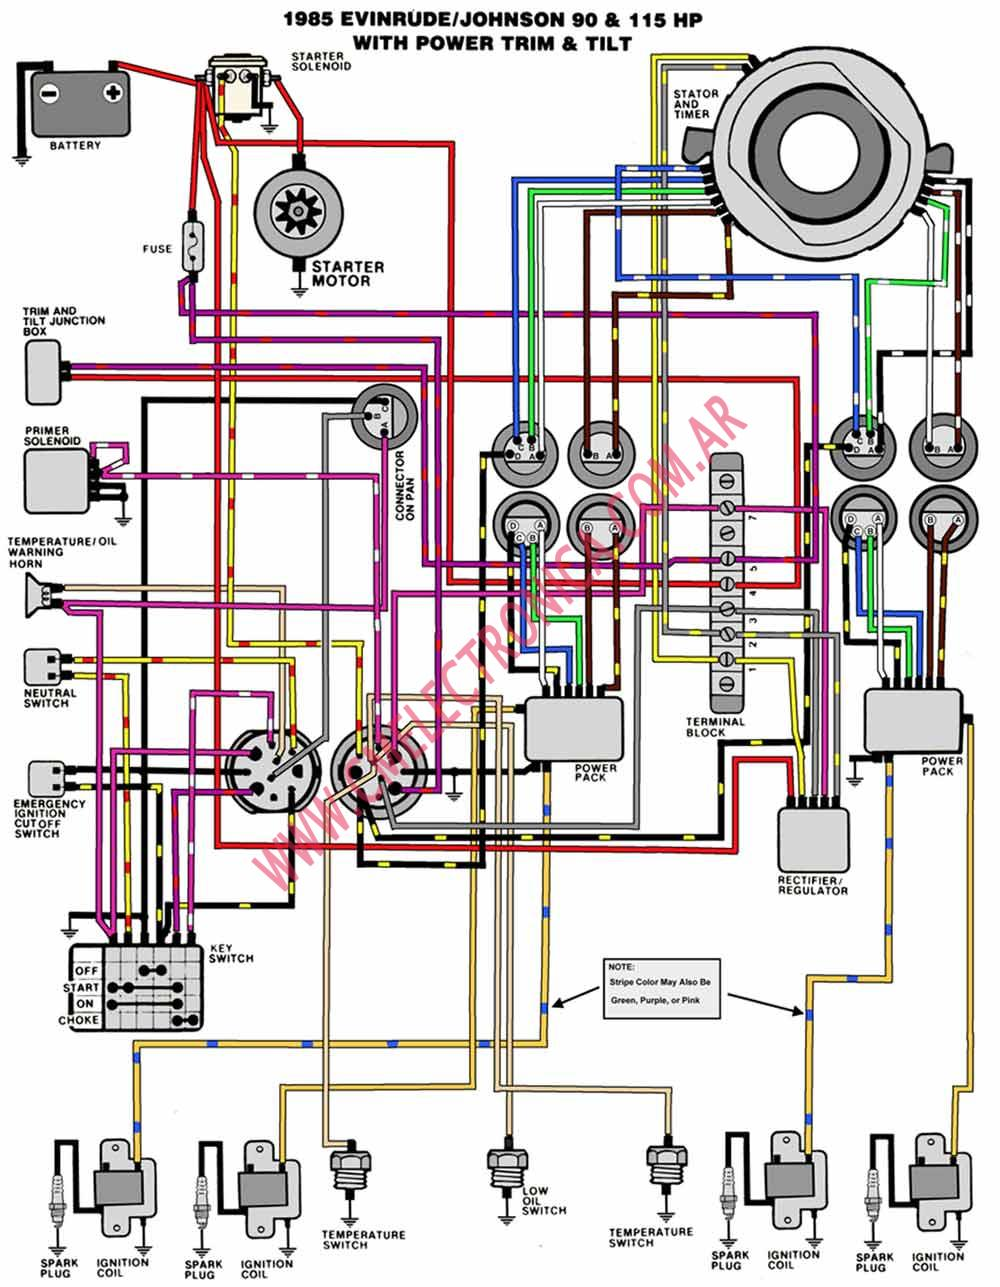 evinrude_johnson 1985_90_115 tnt?resize\\\=665%2C856 mercury optimax wiring diagram mercury verado wiring diagram johnson wiring harness diagram at bayanpartner.co